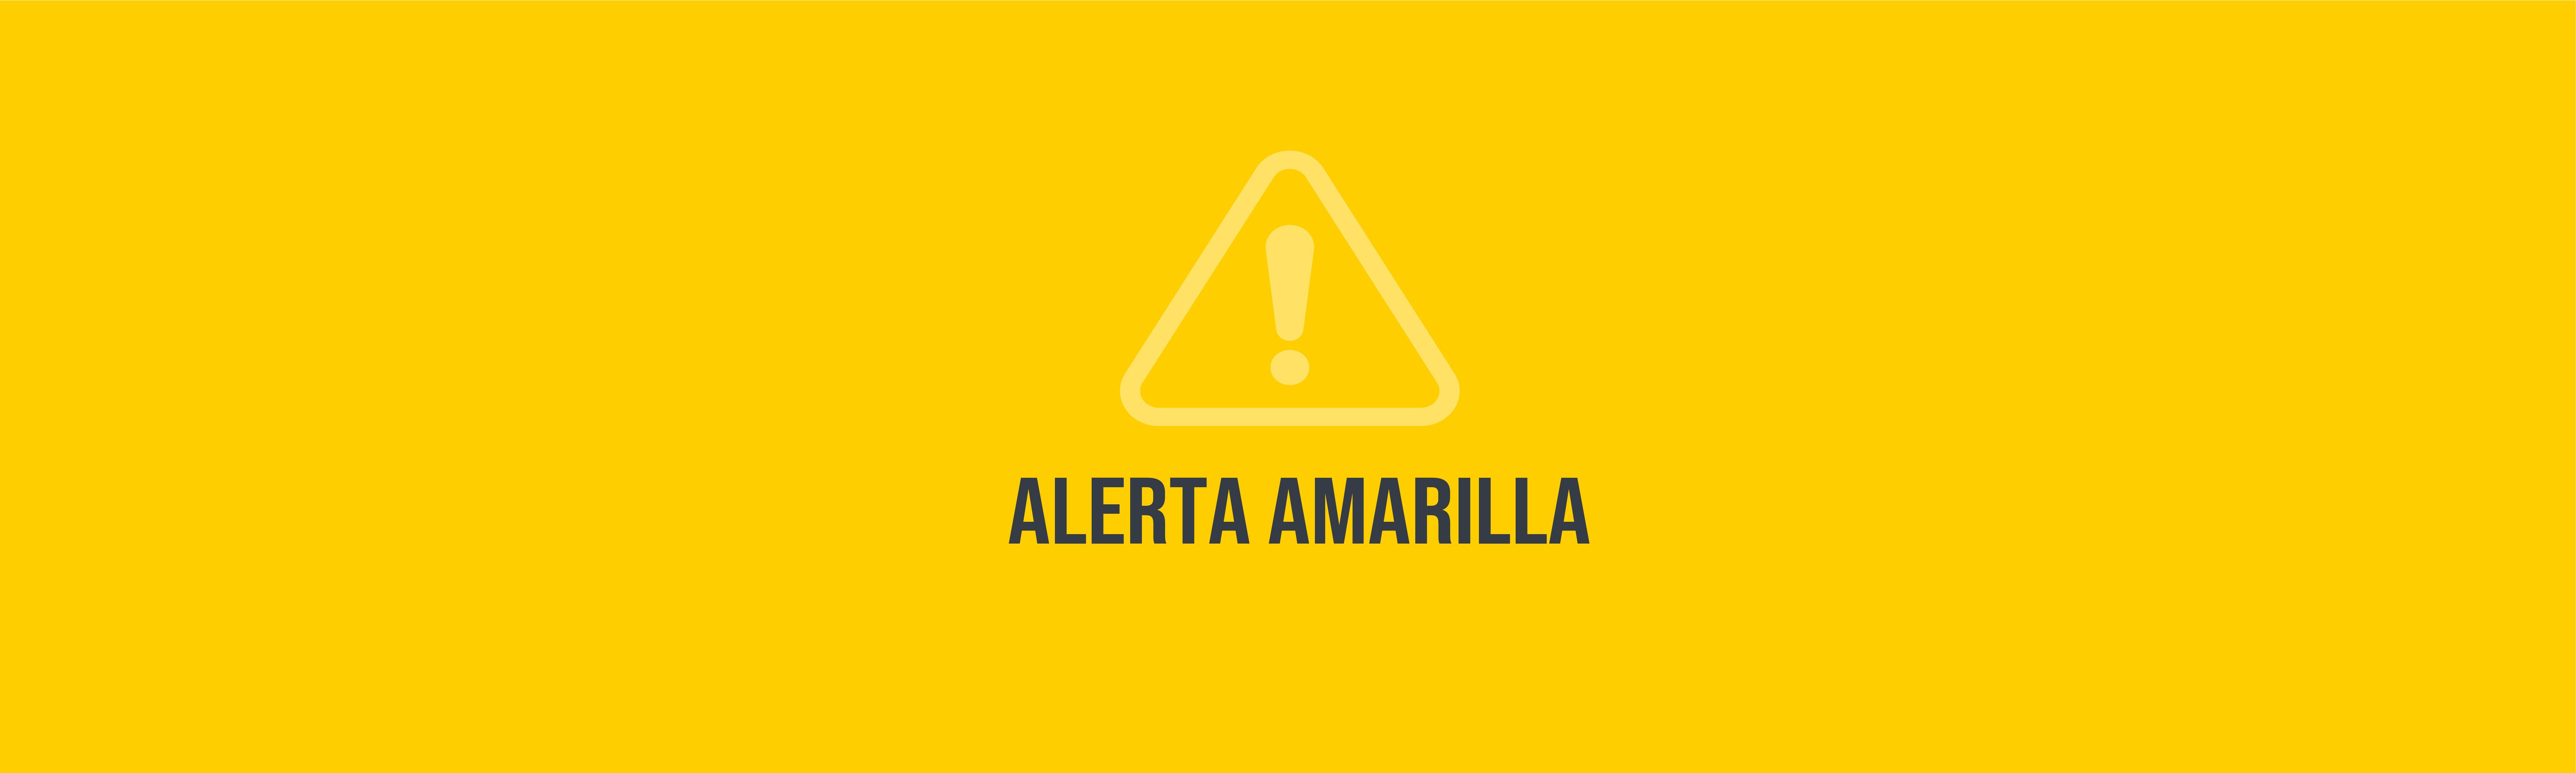 DECLARATORIA DE ALERTA AMARILLA,      ALERTA ROJA en el municipio de Nejapa, ALERTA AMARILLA en el resto del territorio nacional  TORMENTA TROPICAL IOTA                                      15/NOVIEMBRE/2020